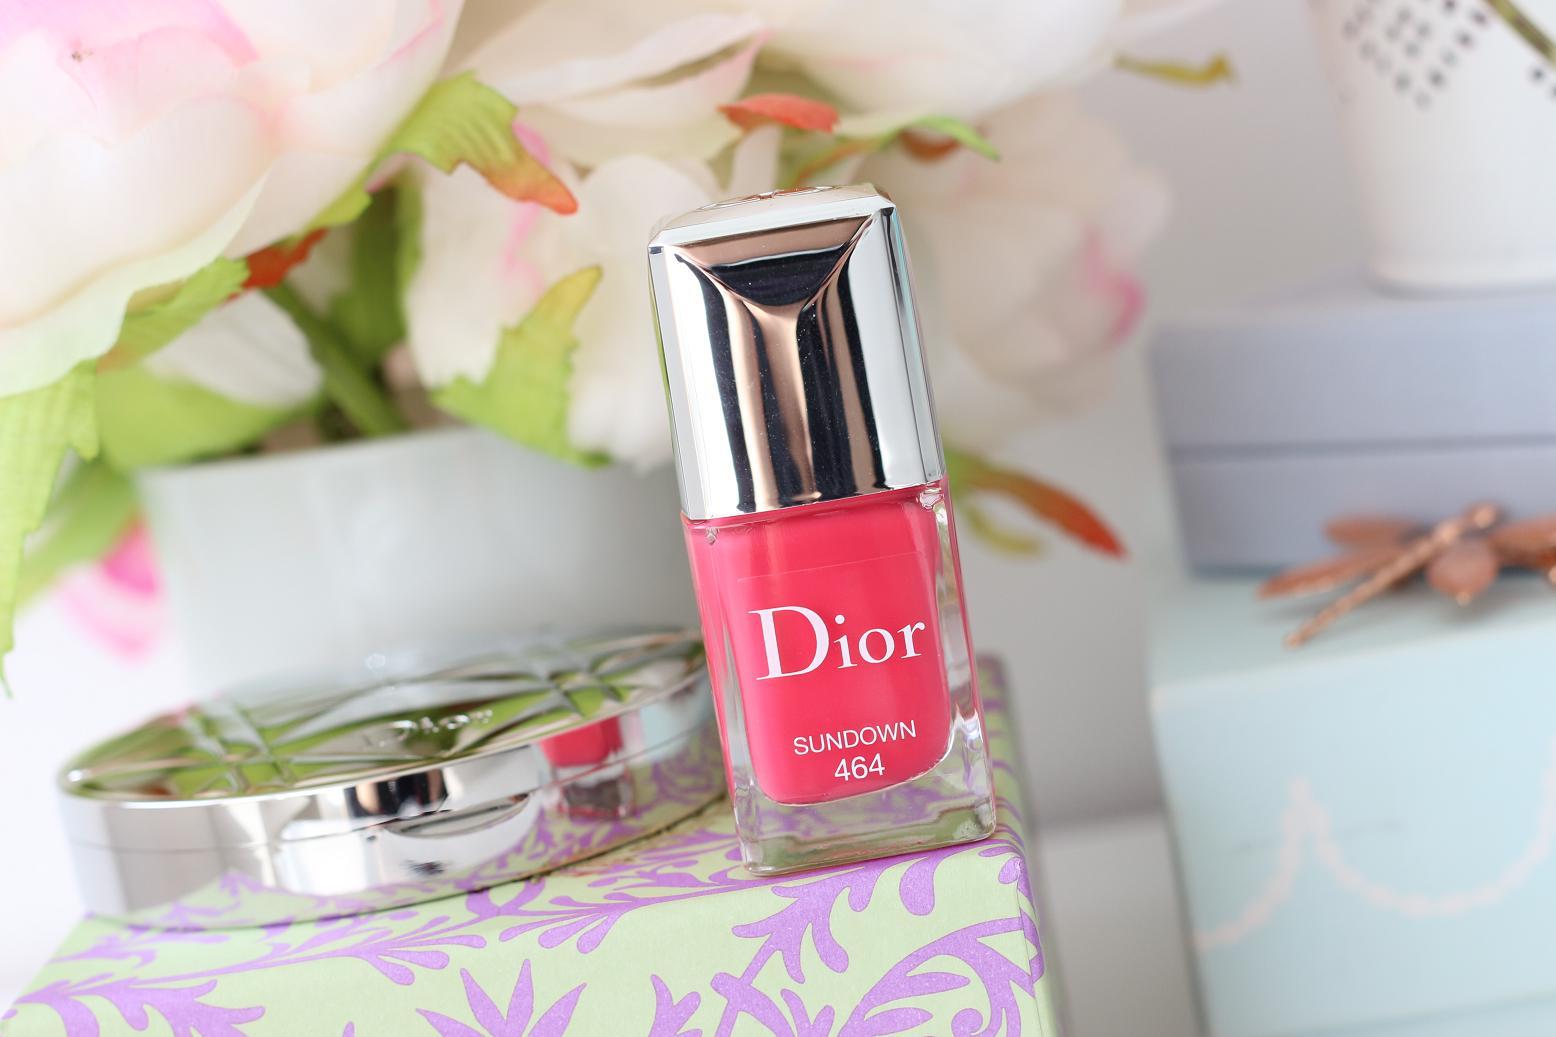 Dior Vernis 464 Sundown